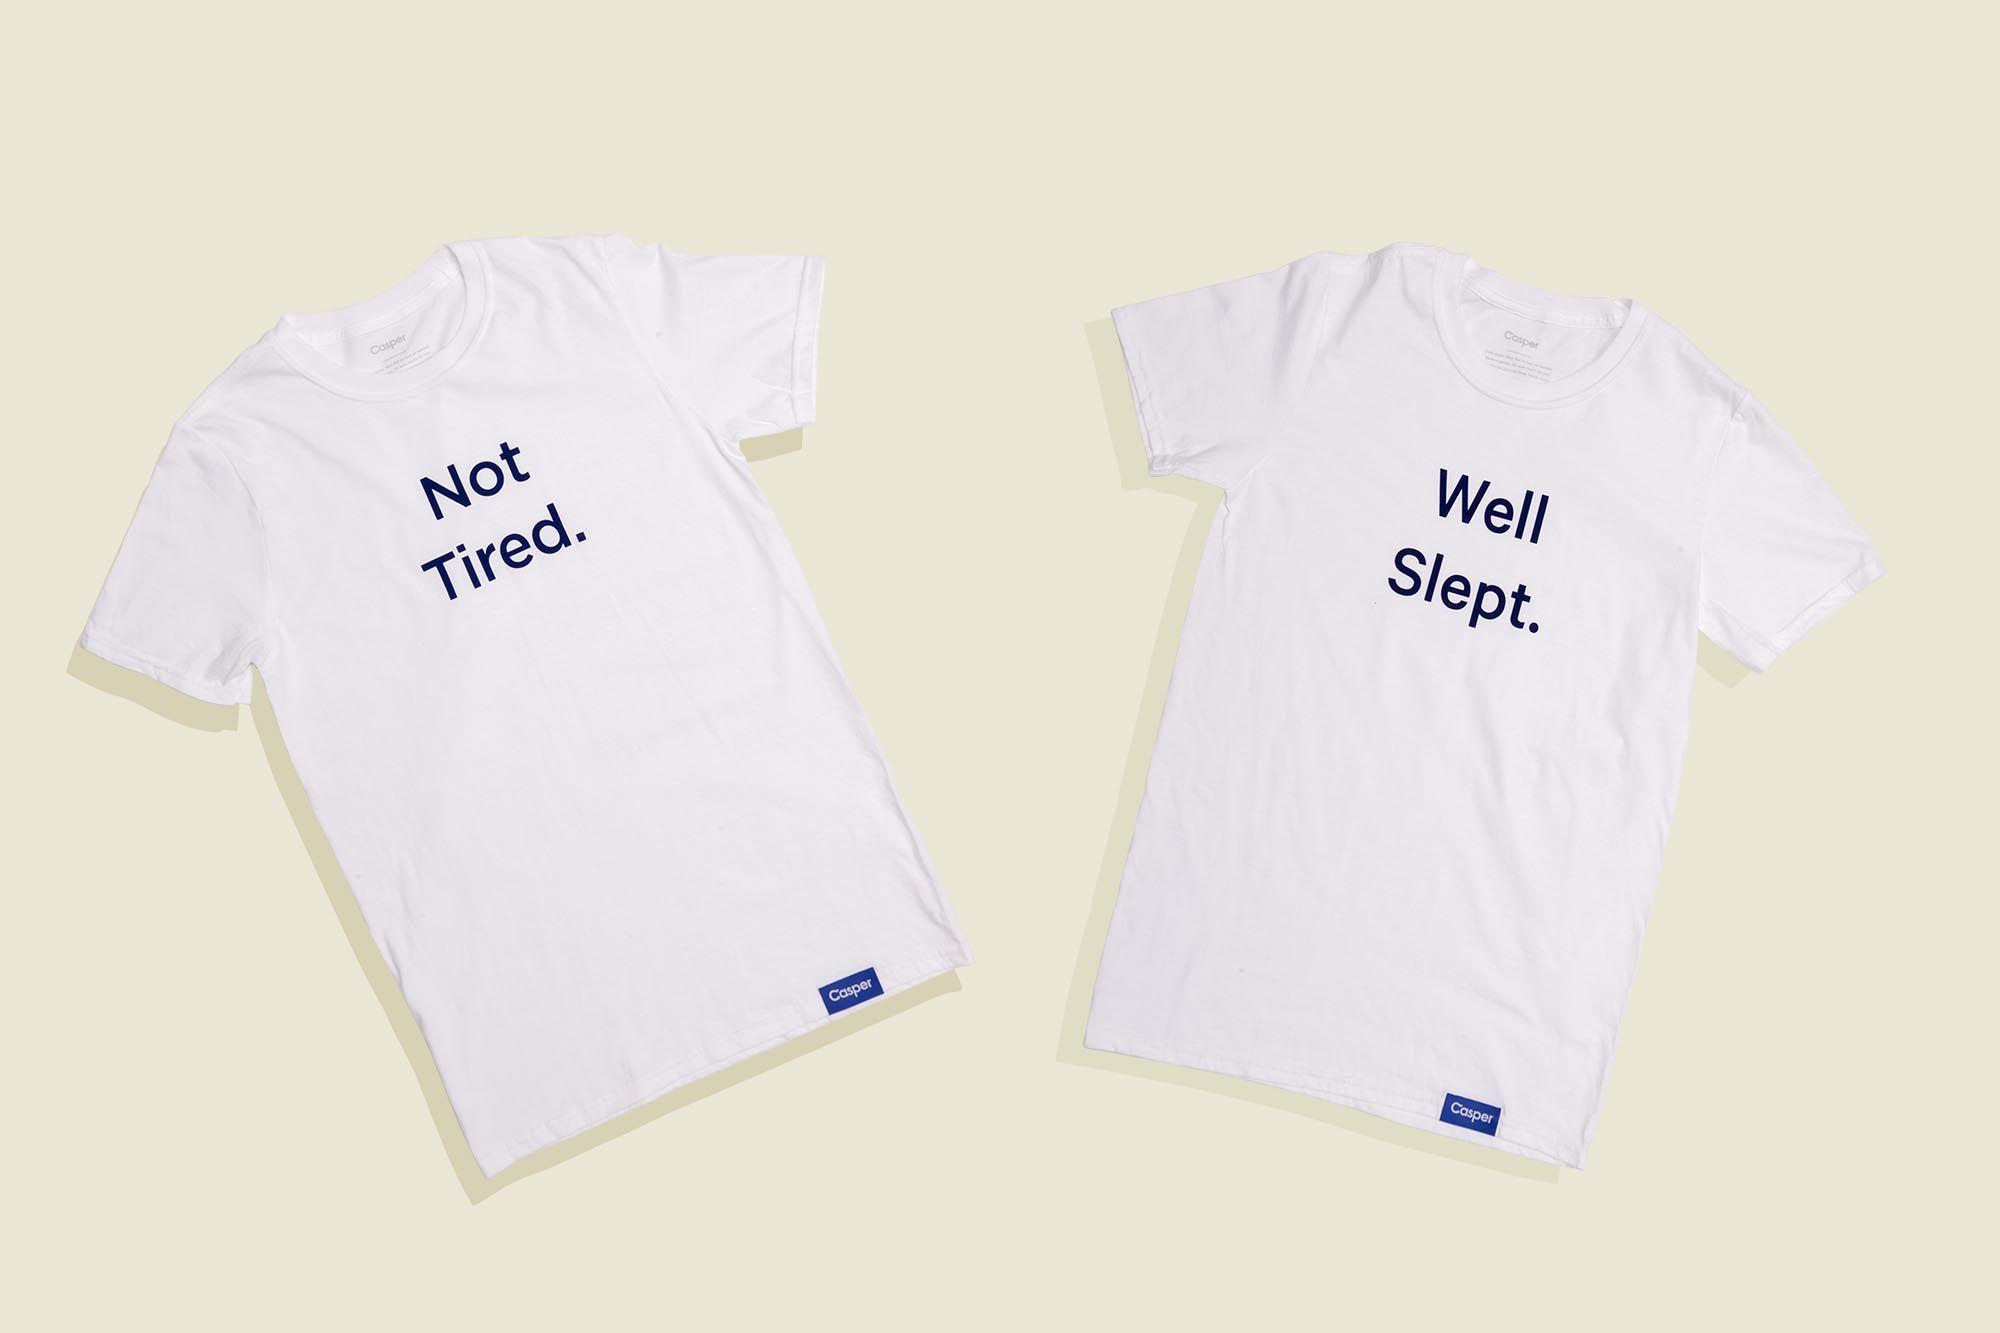 Two shirts